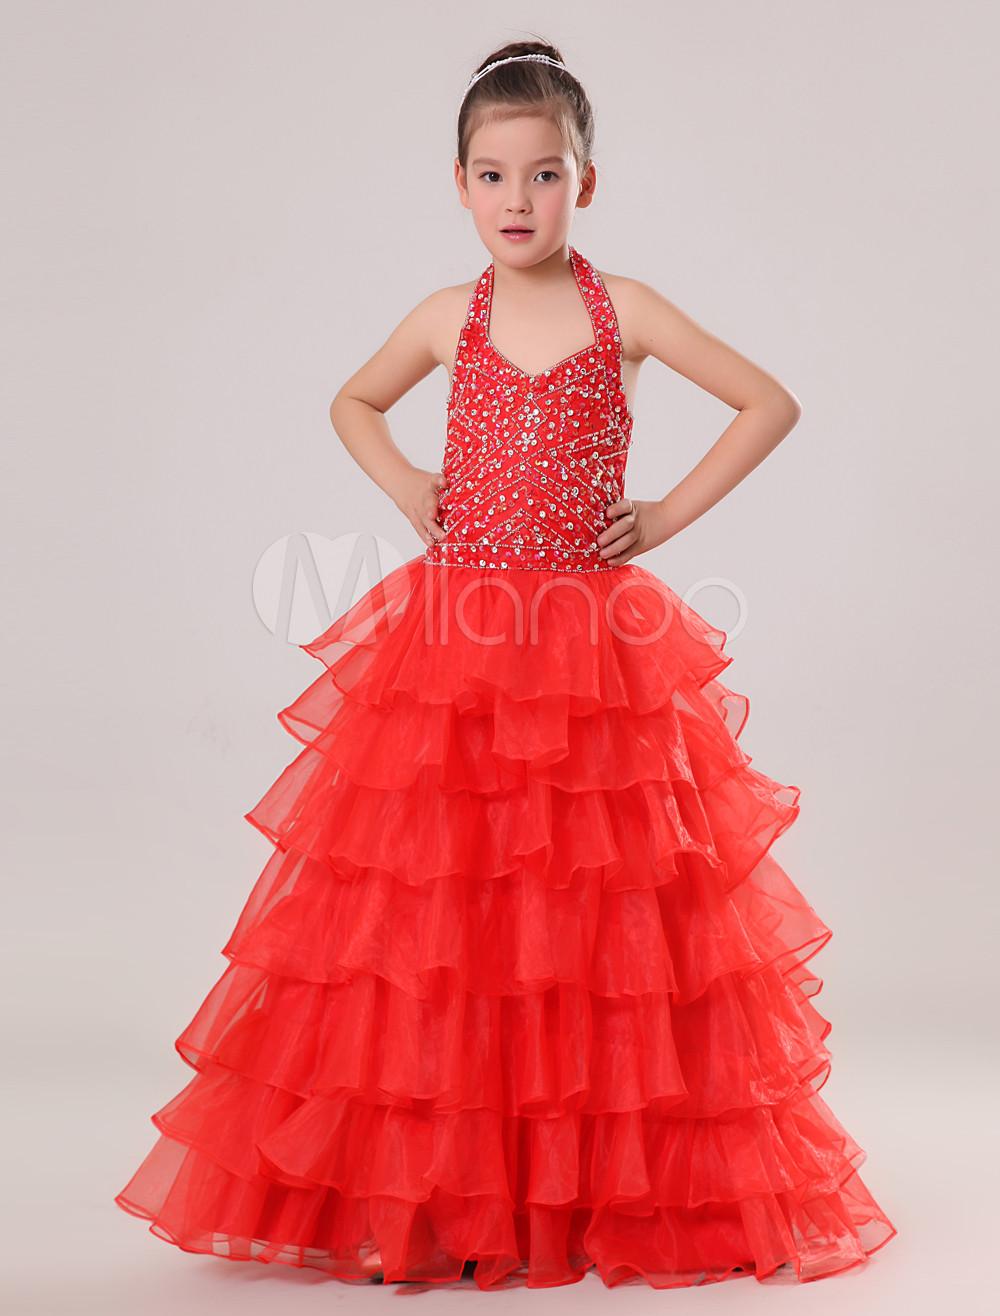 Ball Gown Floor-Length Red Tulle Girls Pageant Dress (Wedding Flower Girl Dresses) photo